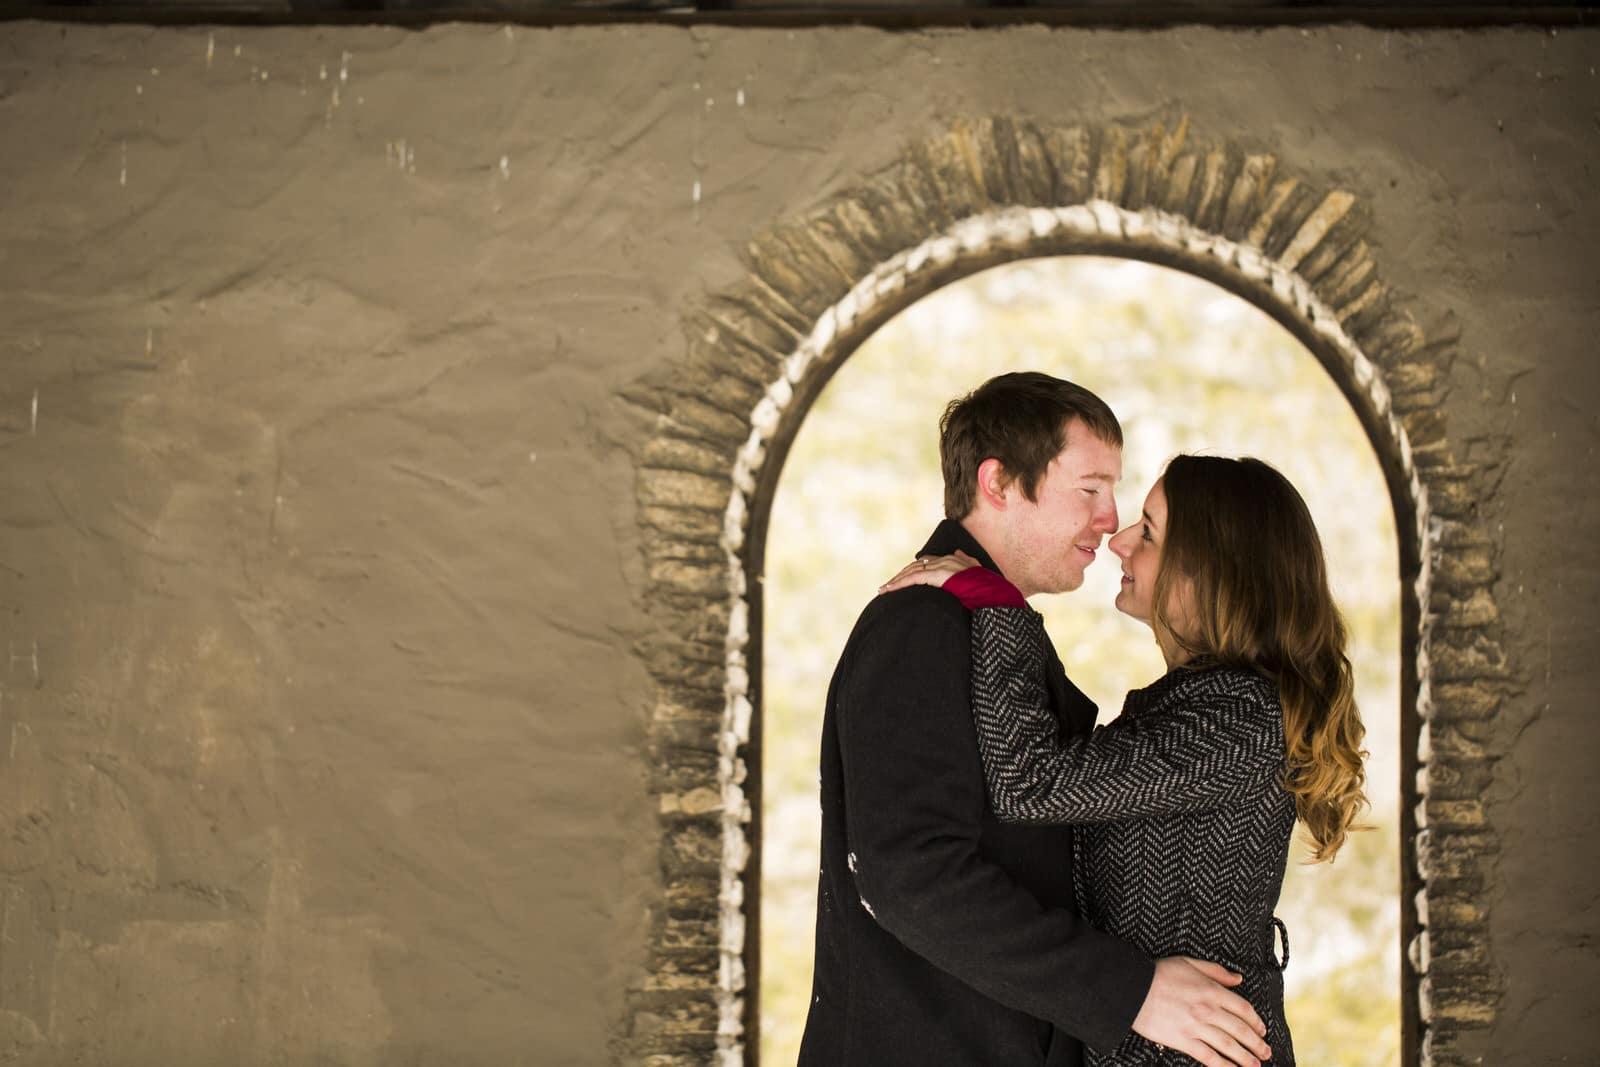 Kelsey-Brett-wintertime-snowfall-engagement-photography-by-Columbus-Ohio-based-Amy-Ann-00010